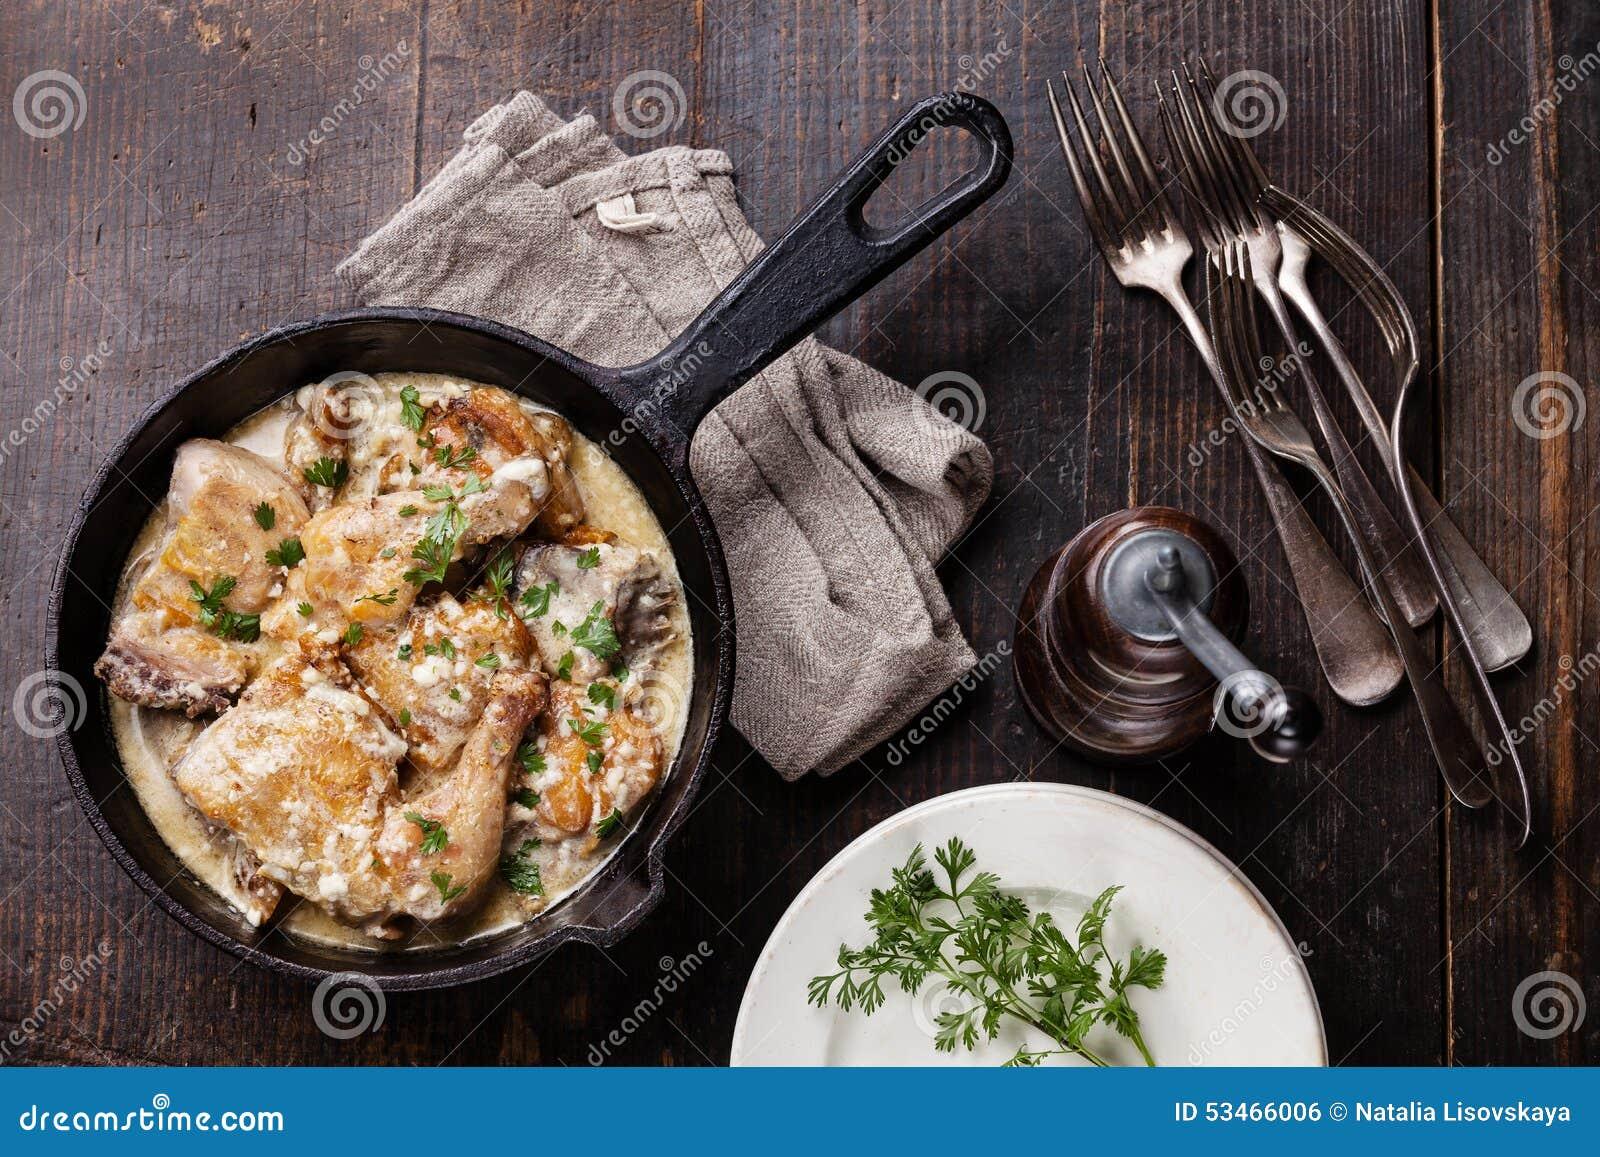 Roasted chicken with creamy garlic sauce